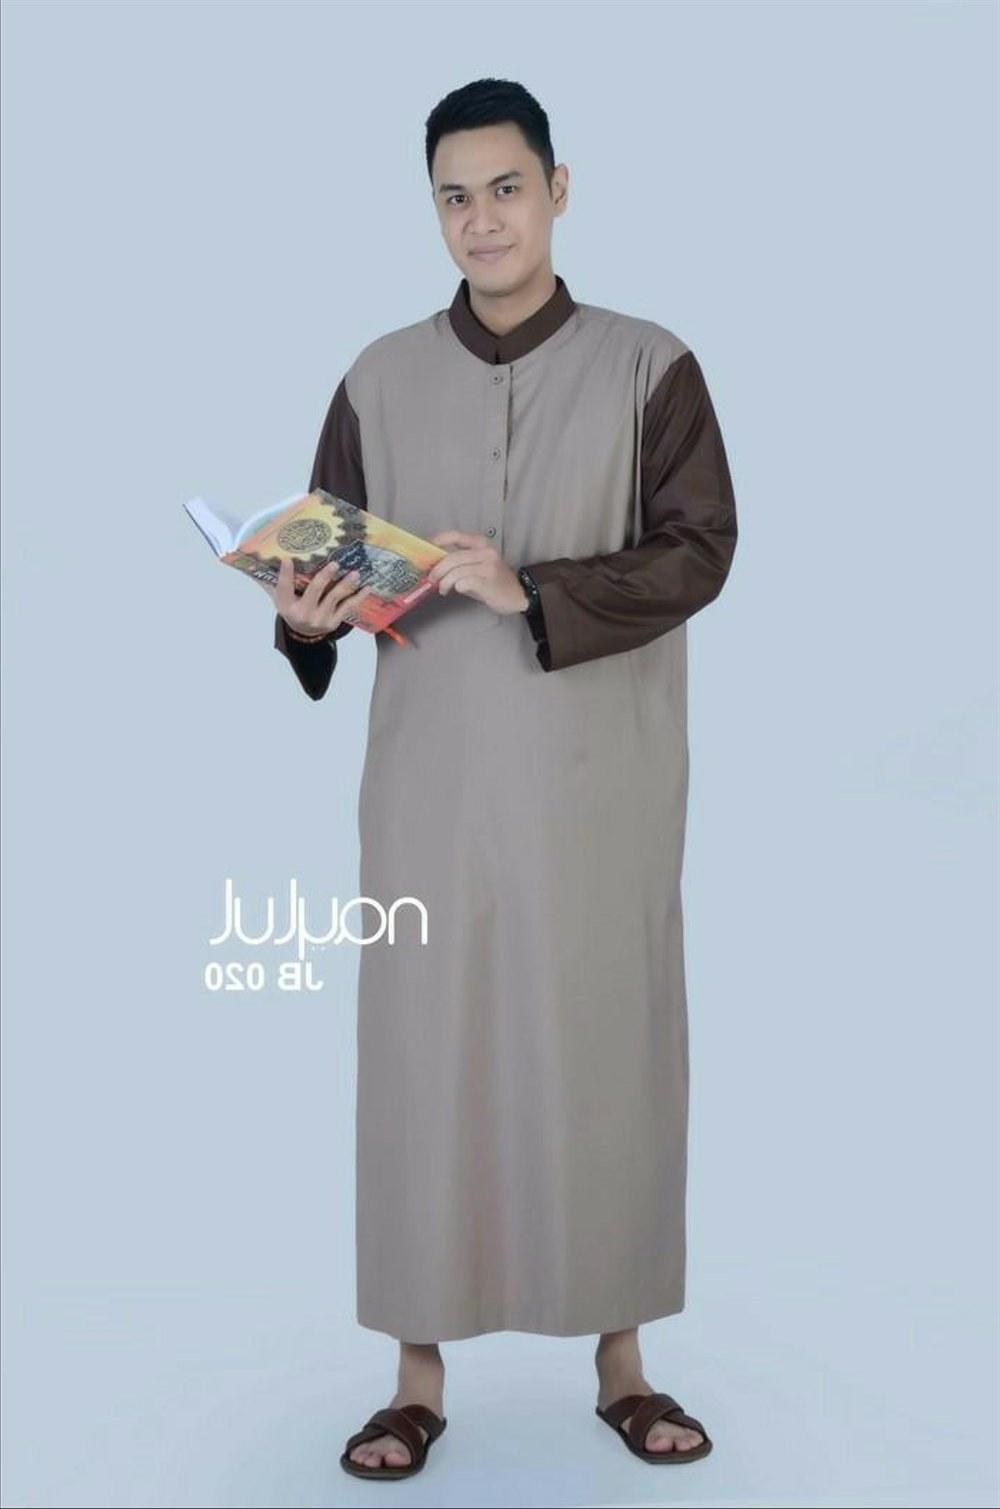 Bentuk Gaun Pengantin Wanita Muslimah Qwdq Camera Camera